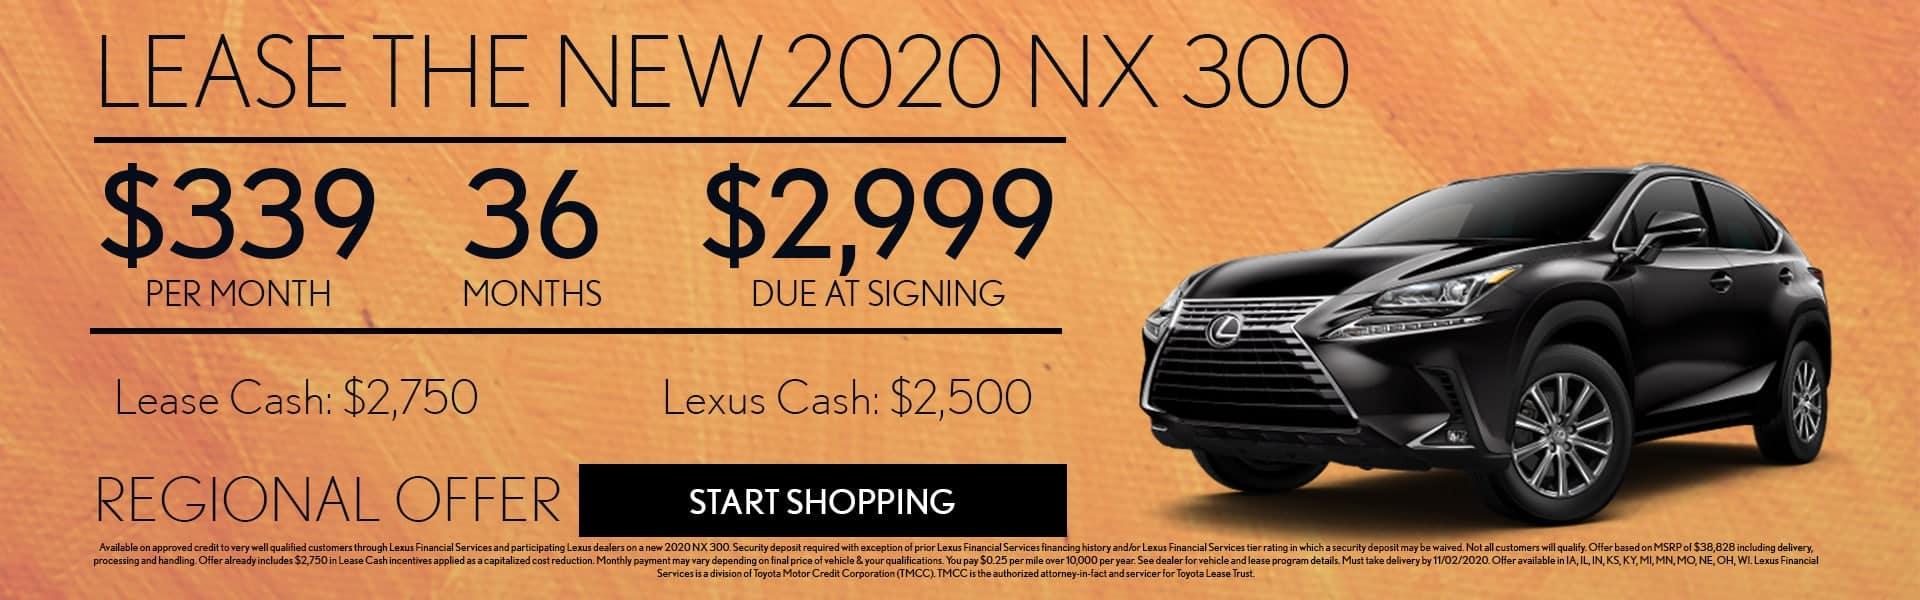 2020 Lexus NX 300 Lease Offer